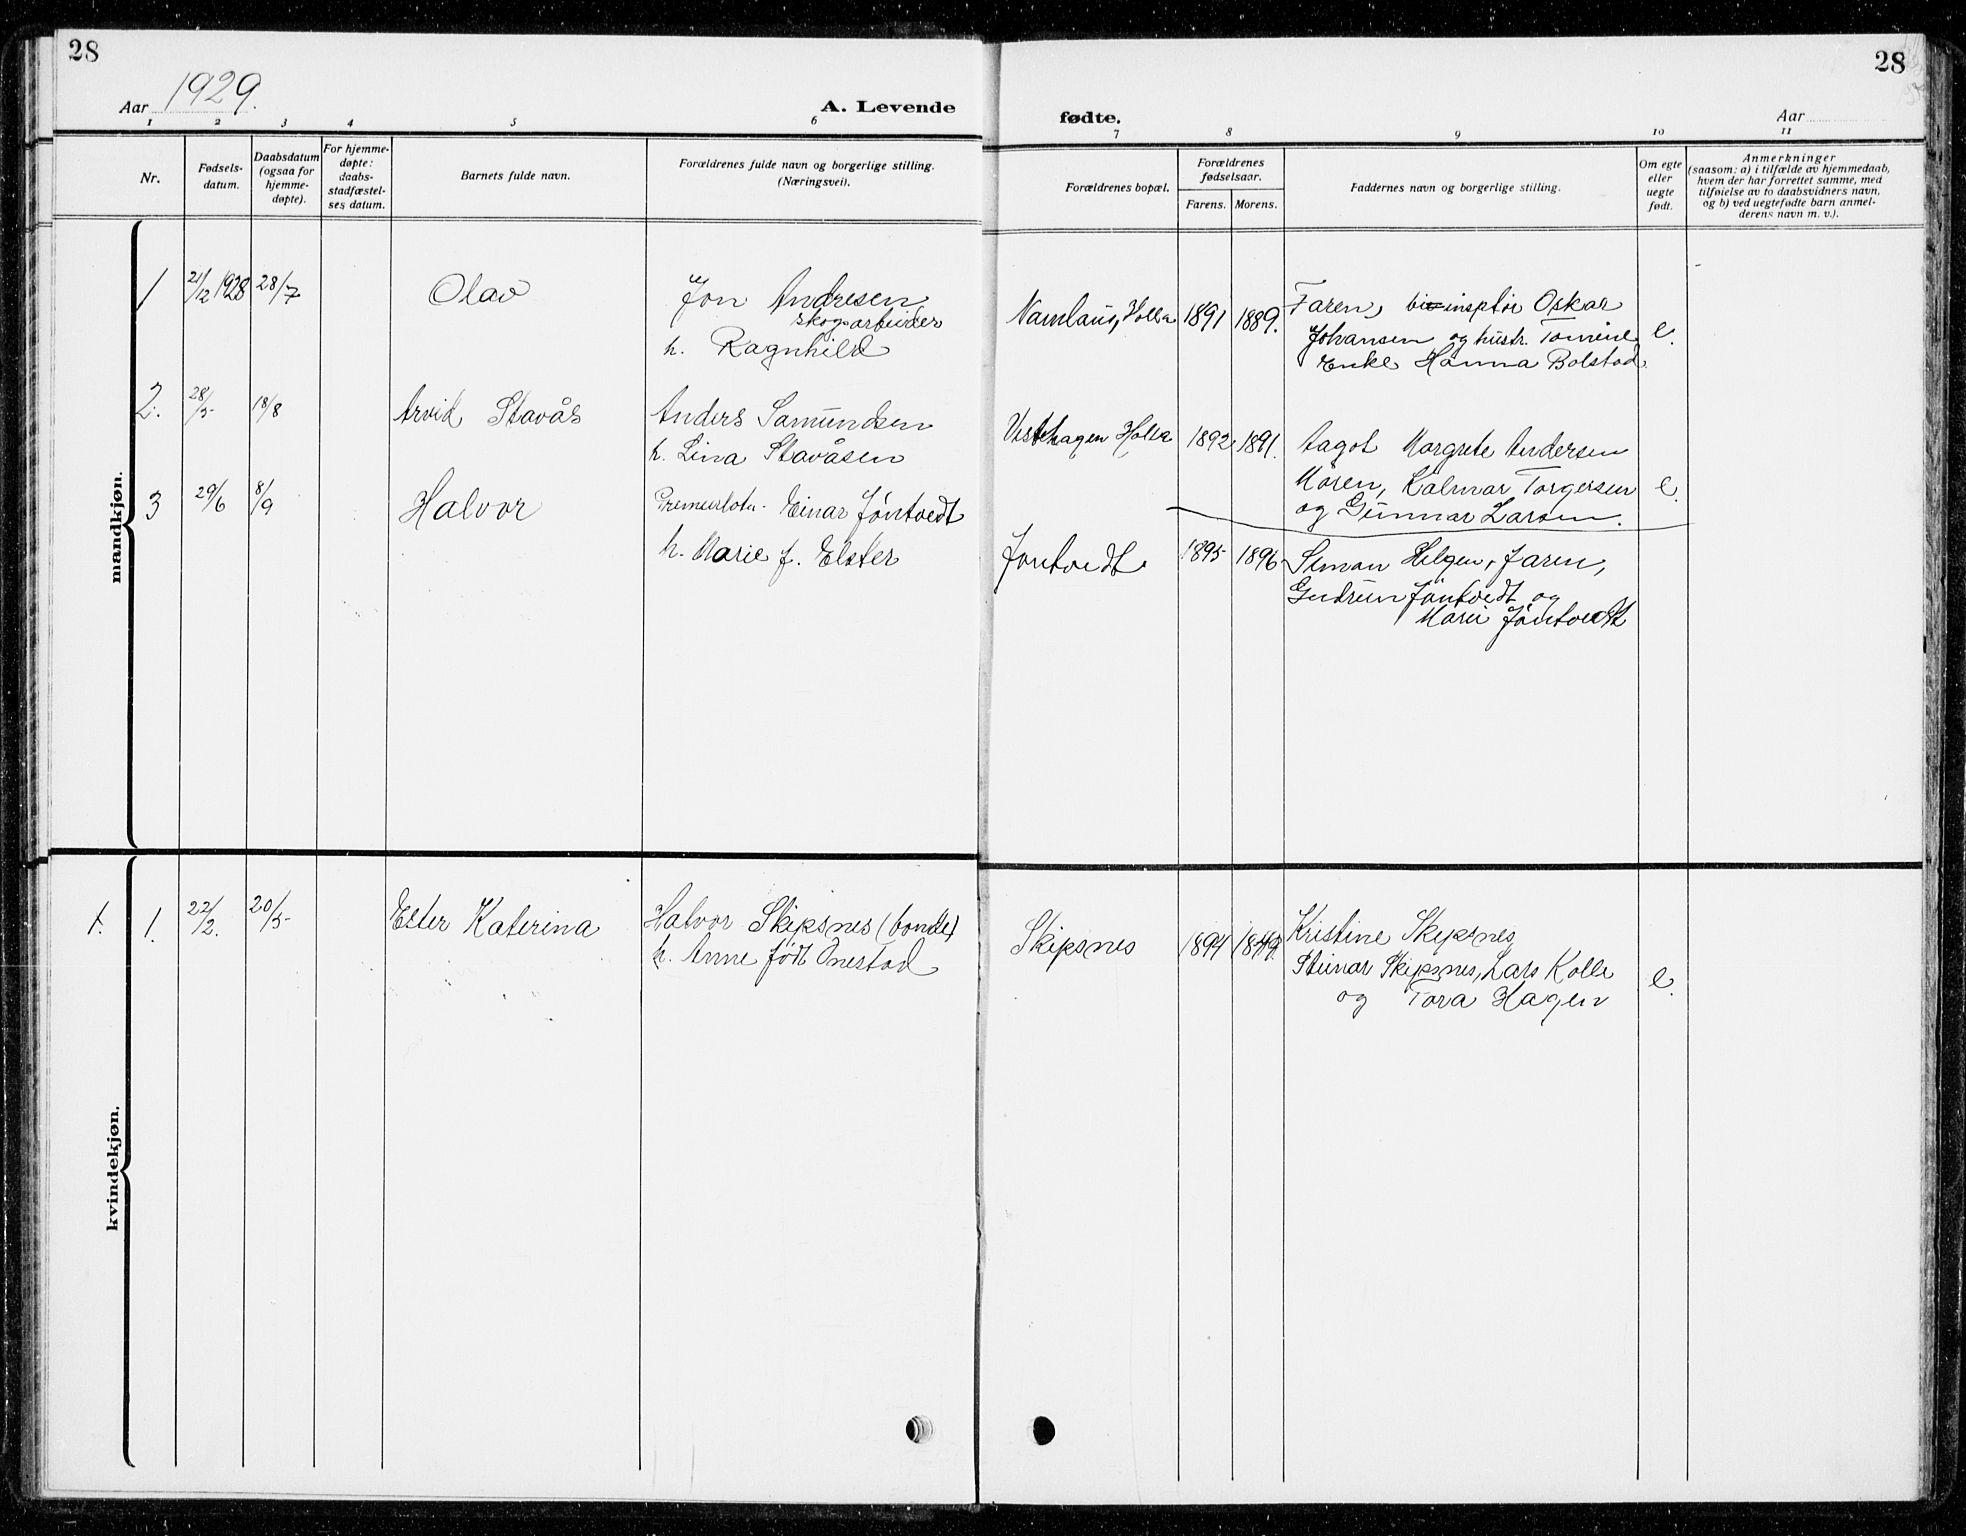 SAKO, Holla kirkebøker, G/Gb/L0003: Klokkerbok nr. II 3, 1914-1941, s. 28